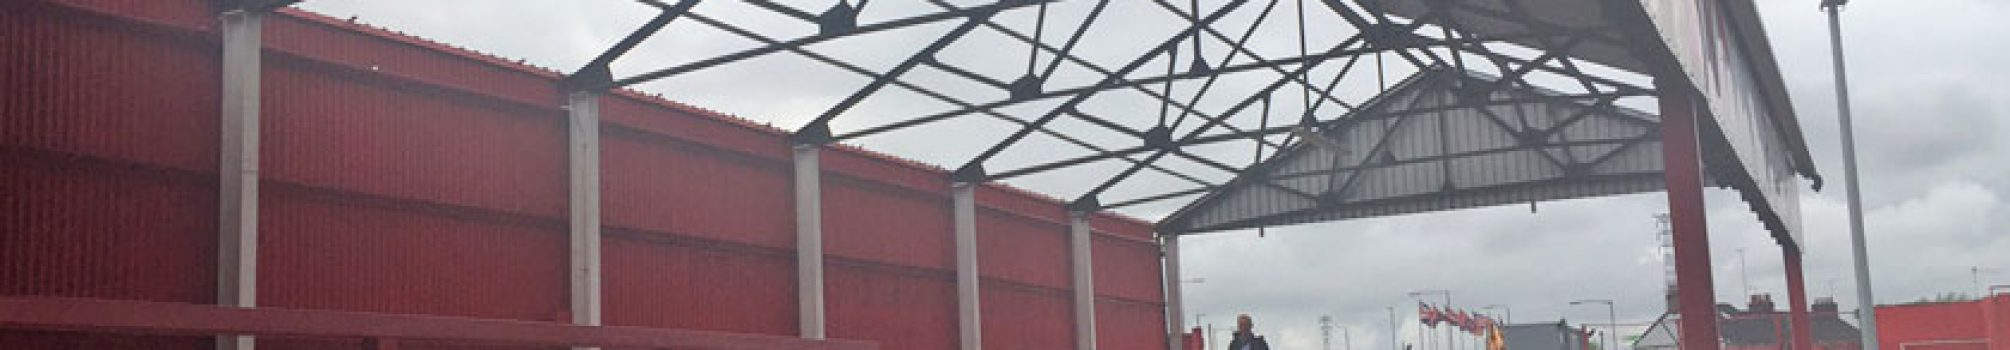 stadium-roof-off